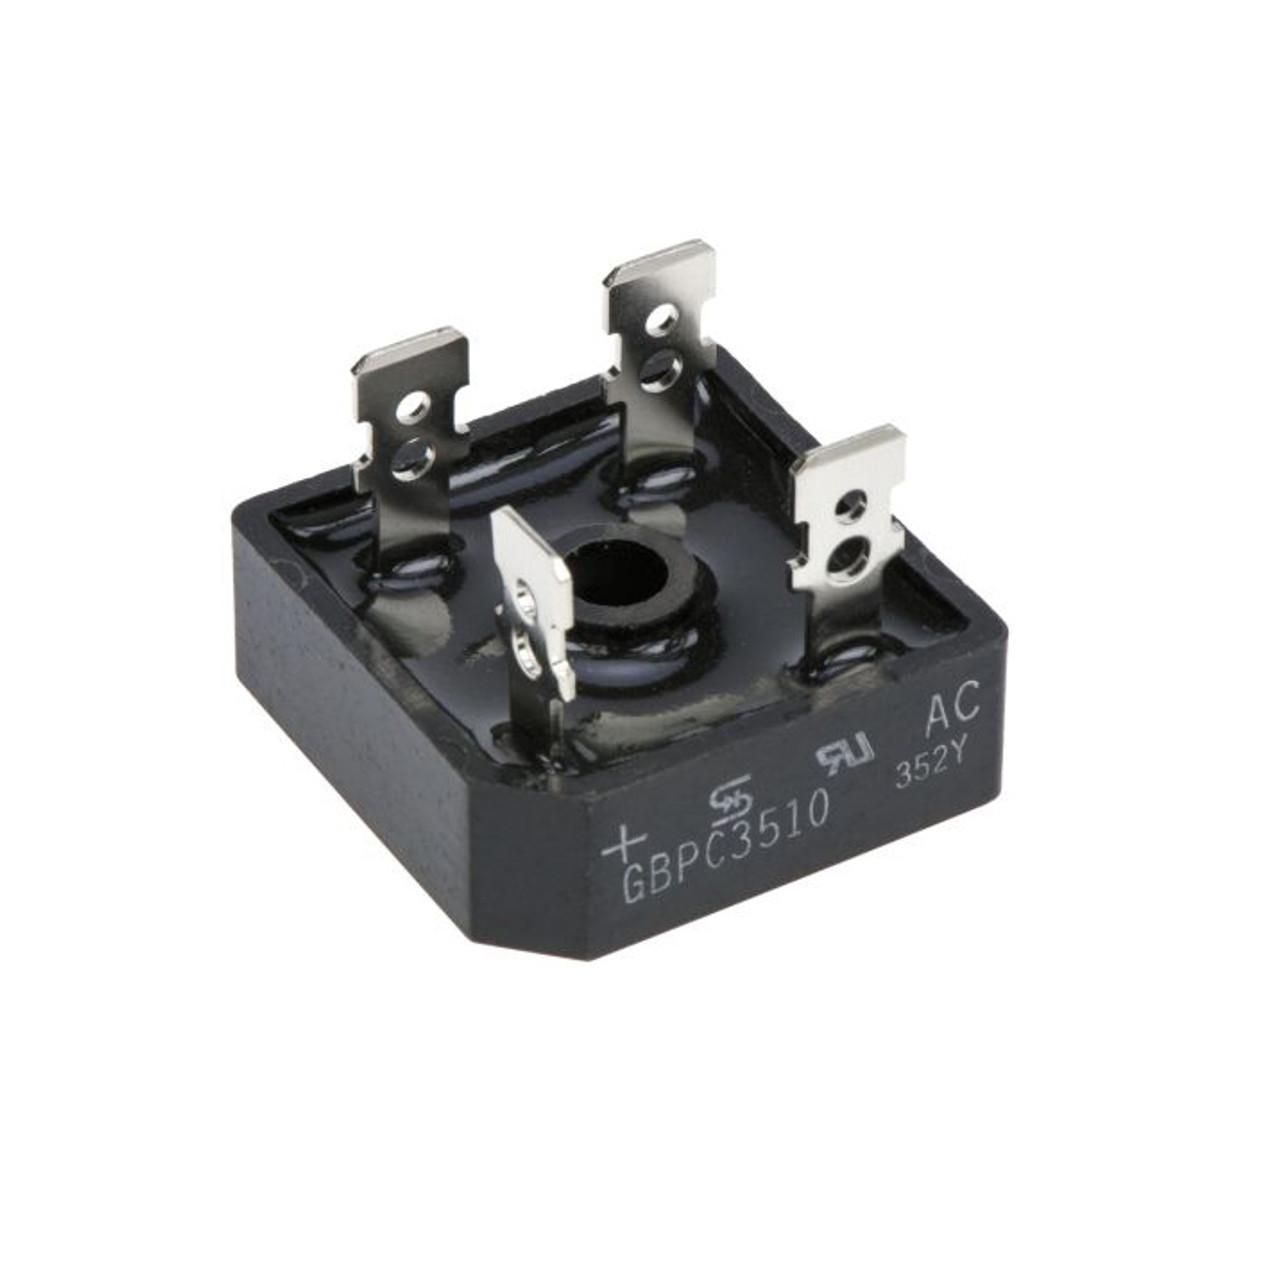 Bridge Rectifier Module GBPC3510 1000V/35A